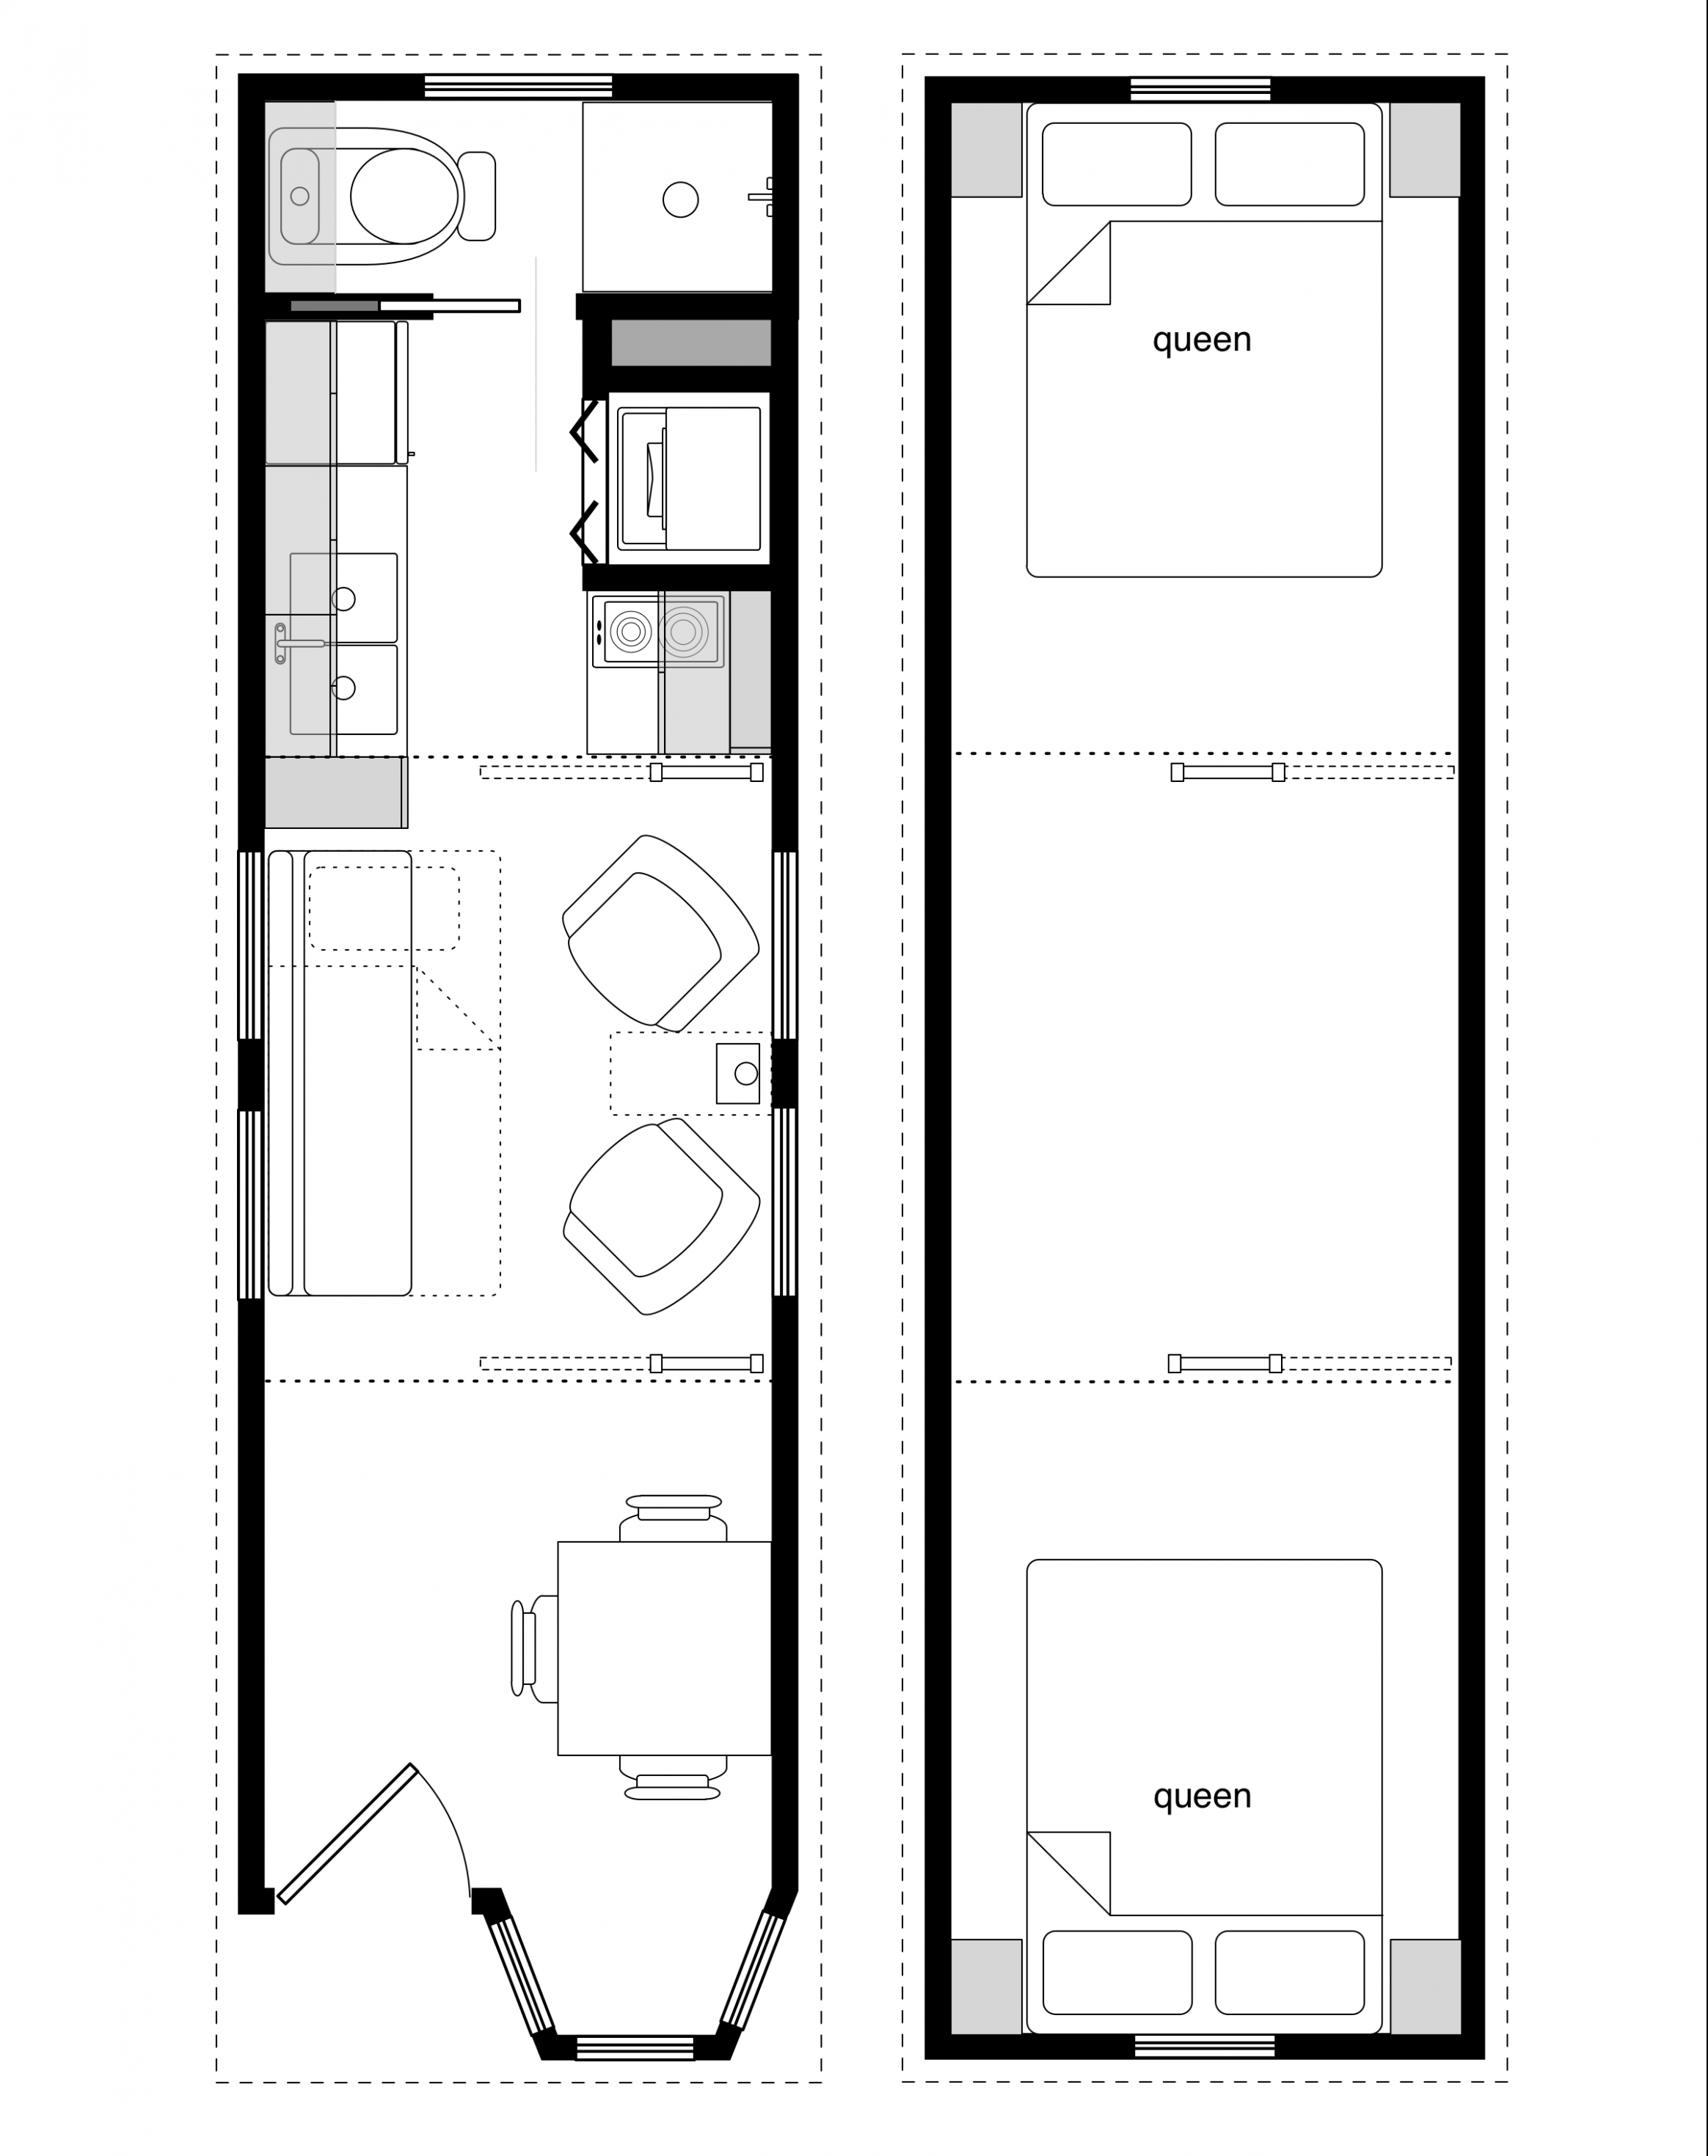 Sample Floor Plans For The 14 214 Coastal Cottage